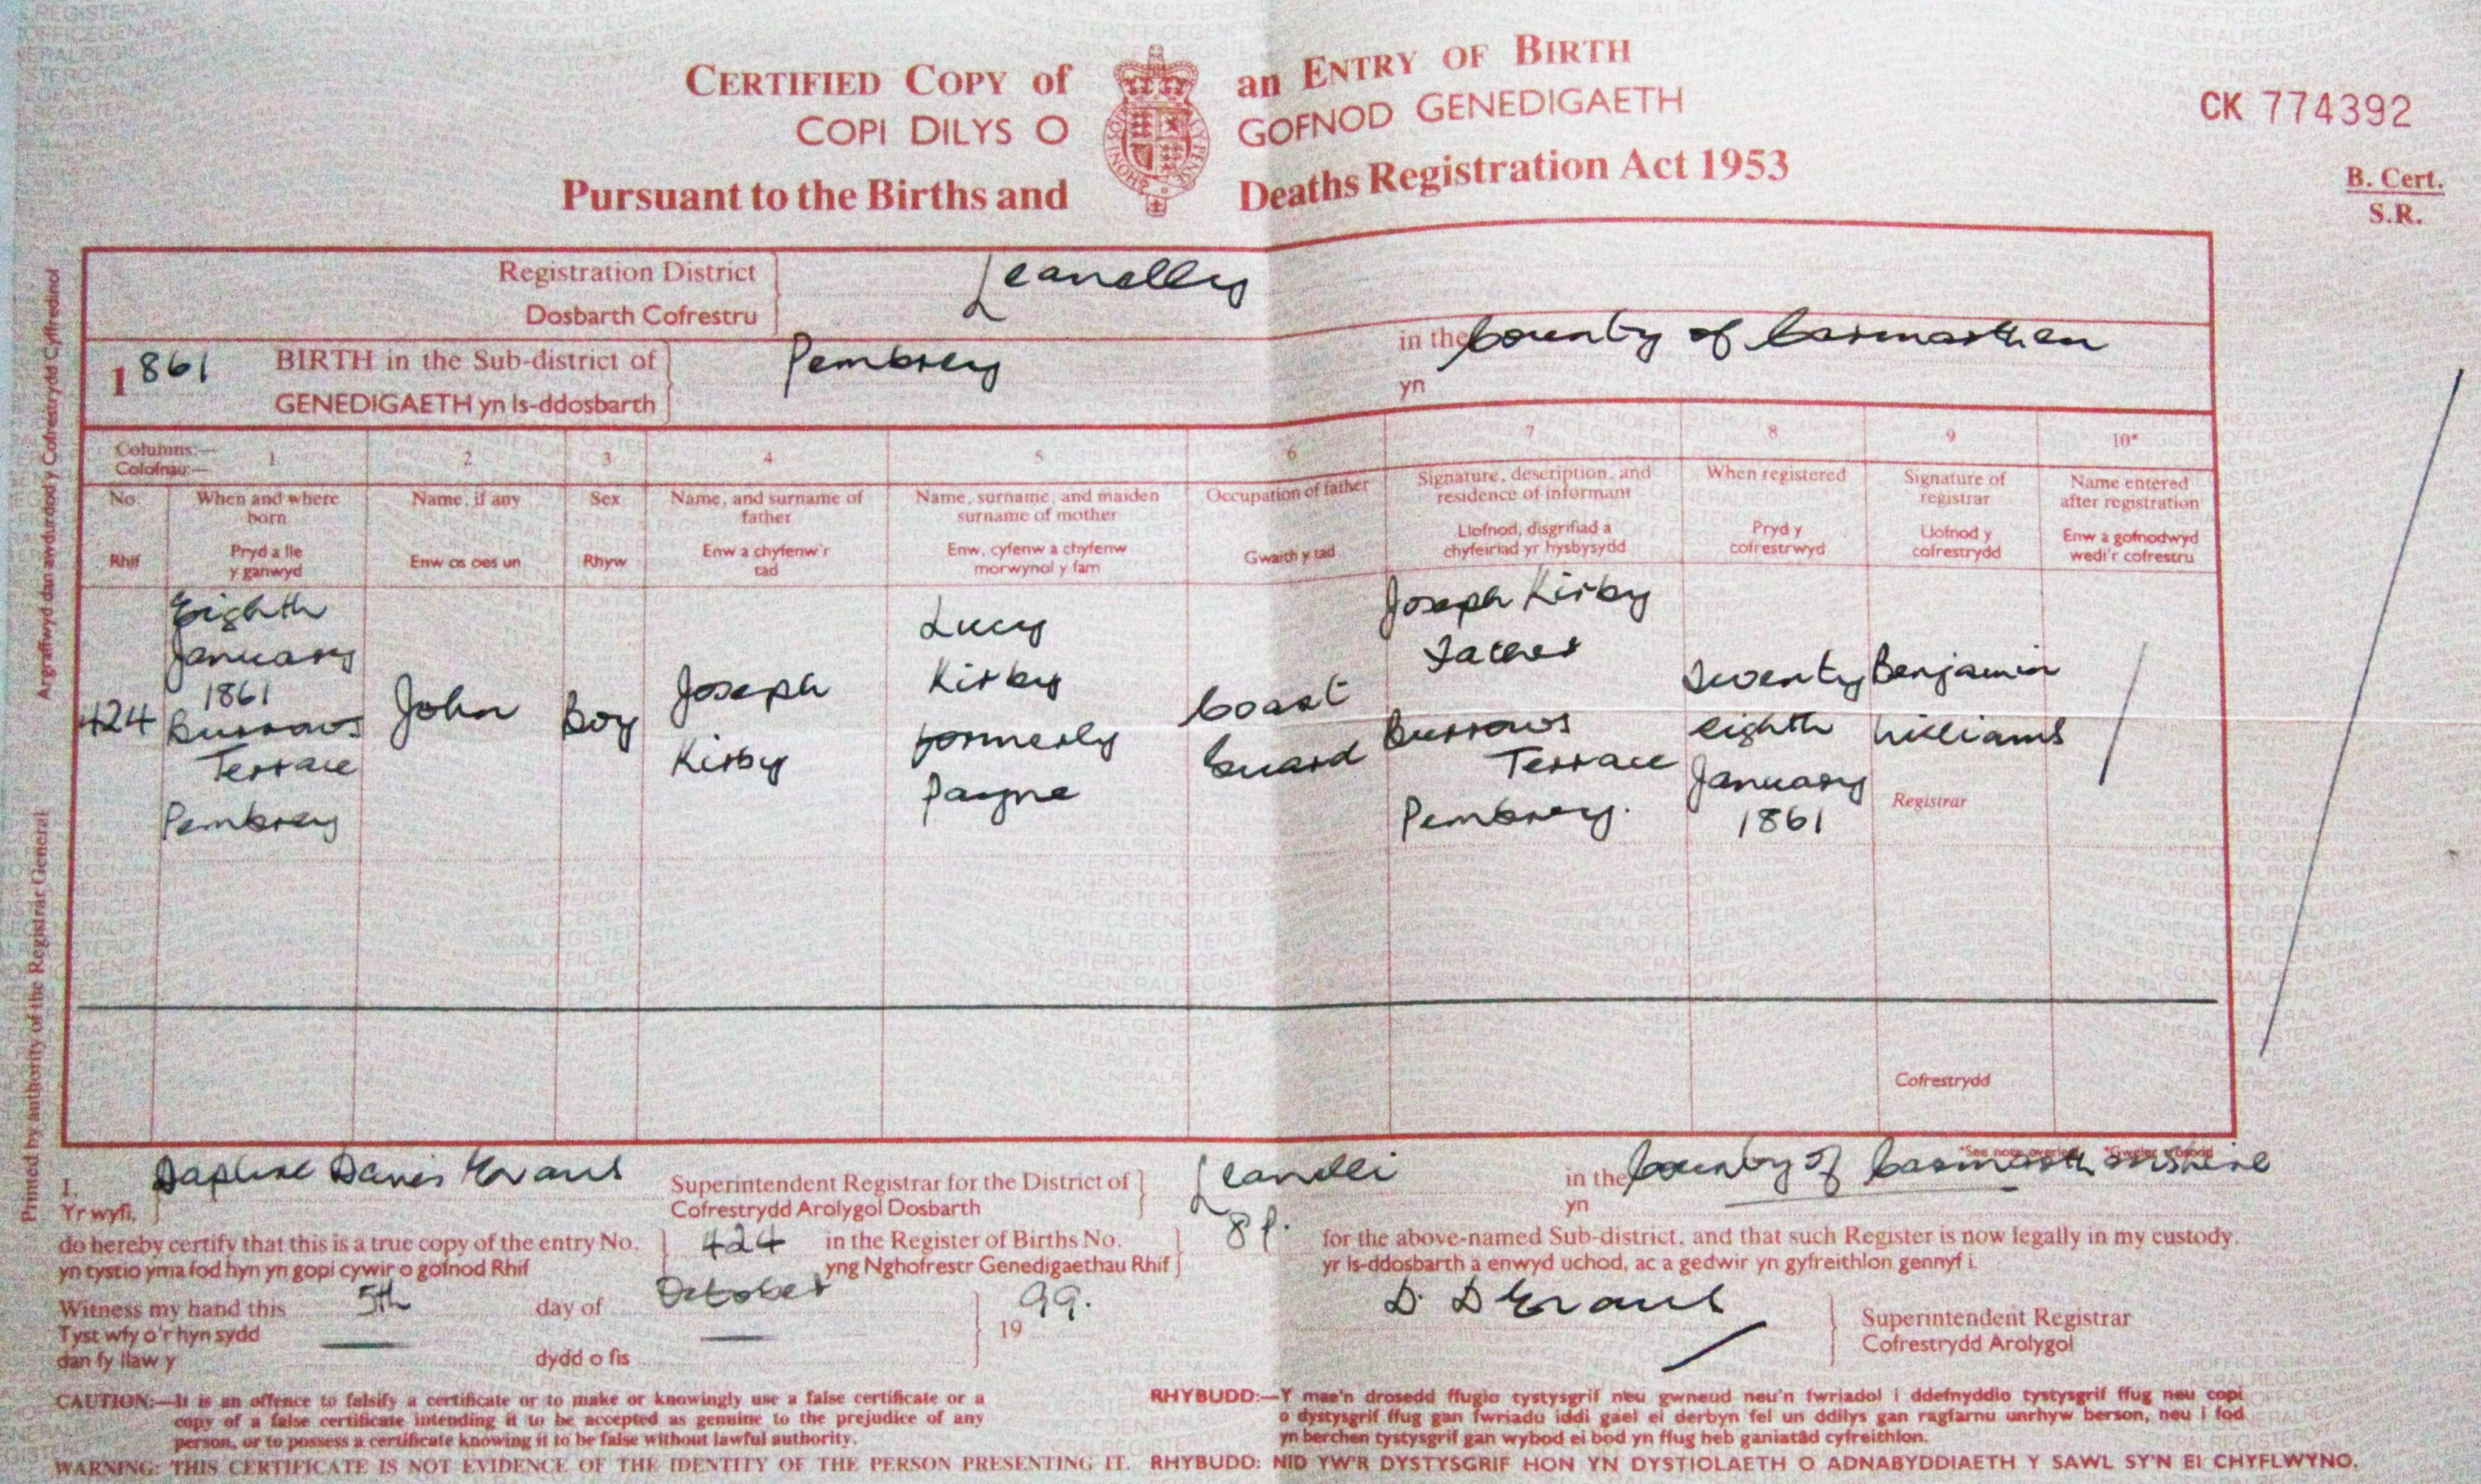 Birth certificate for John Kirby